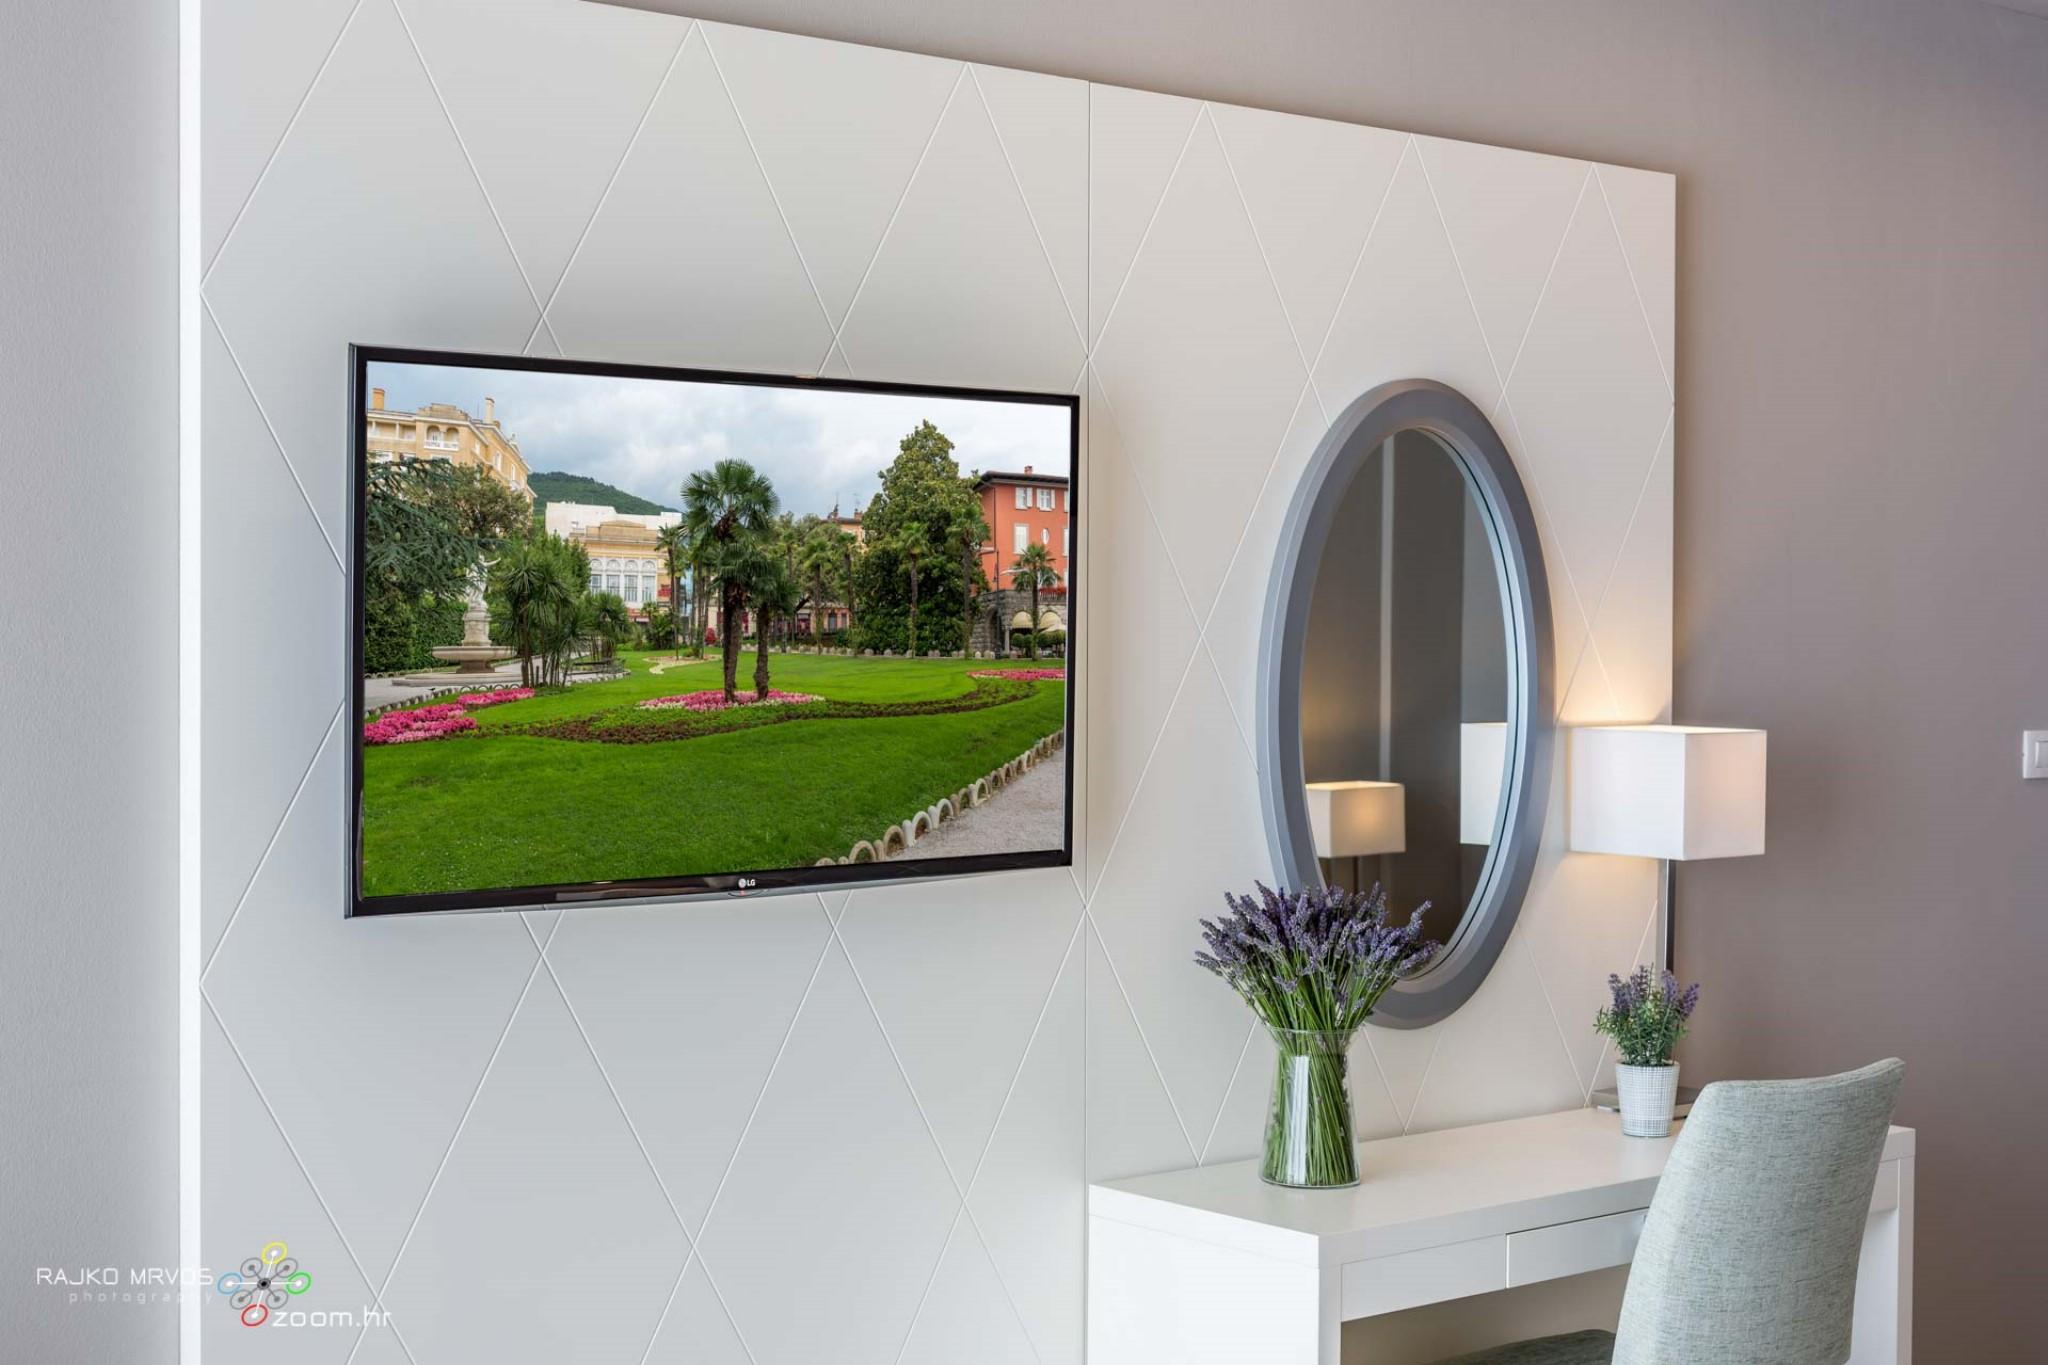 fotografiranje-interijera-fotograf-eksterijera-apartmana-vila-kuca-apartman-Preelook-6